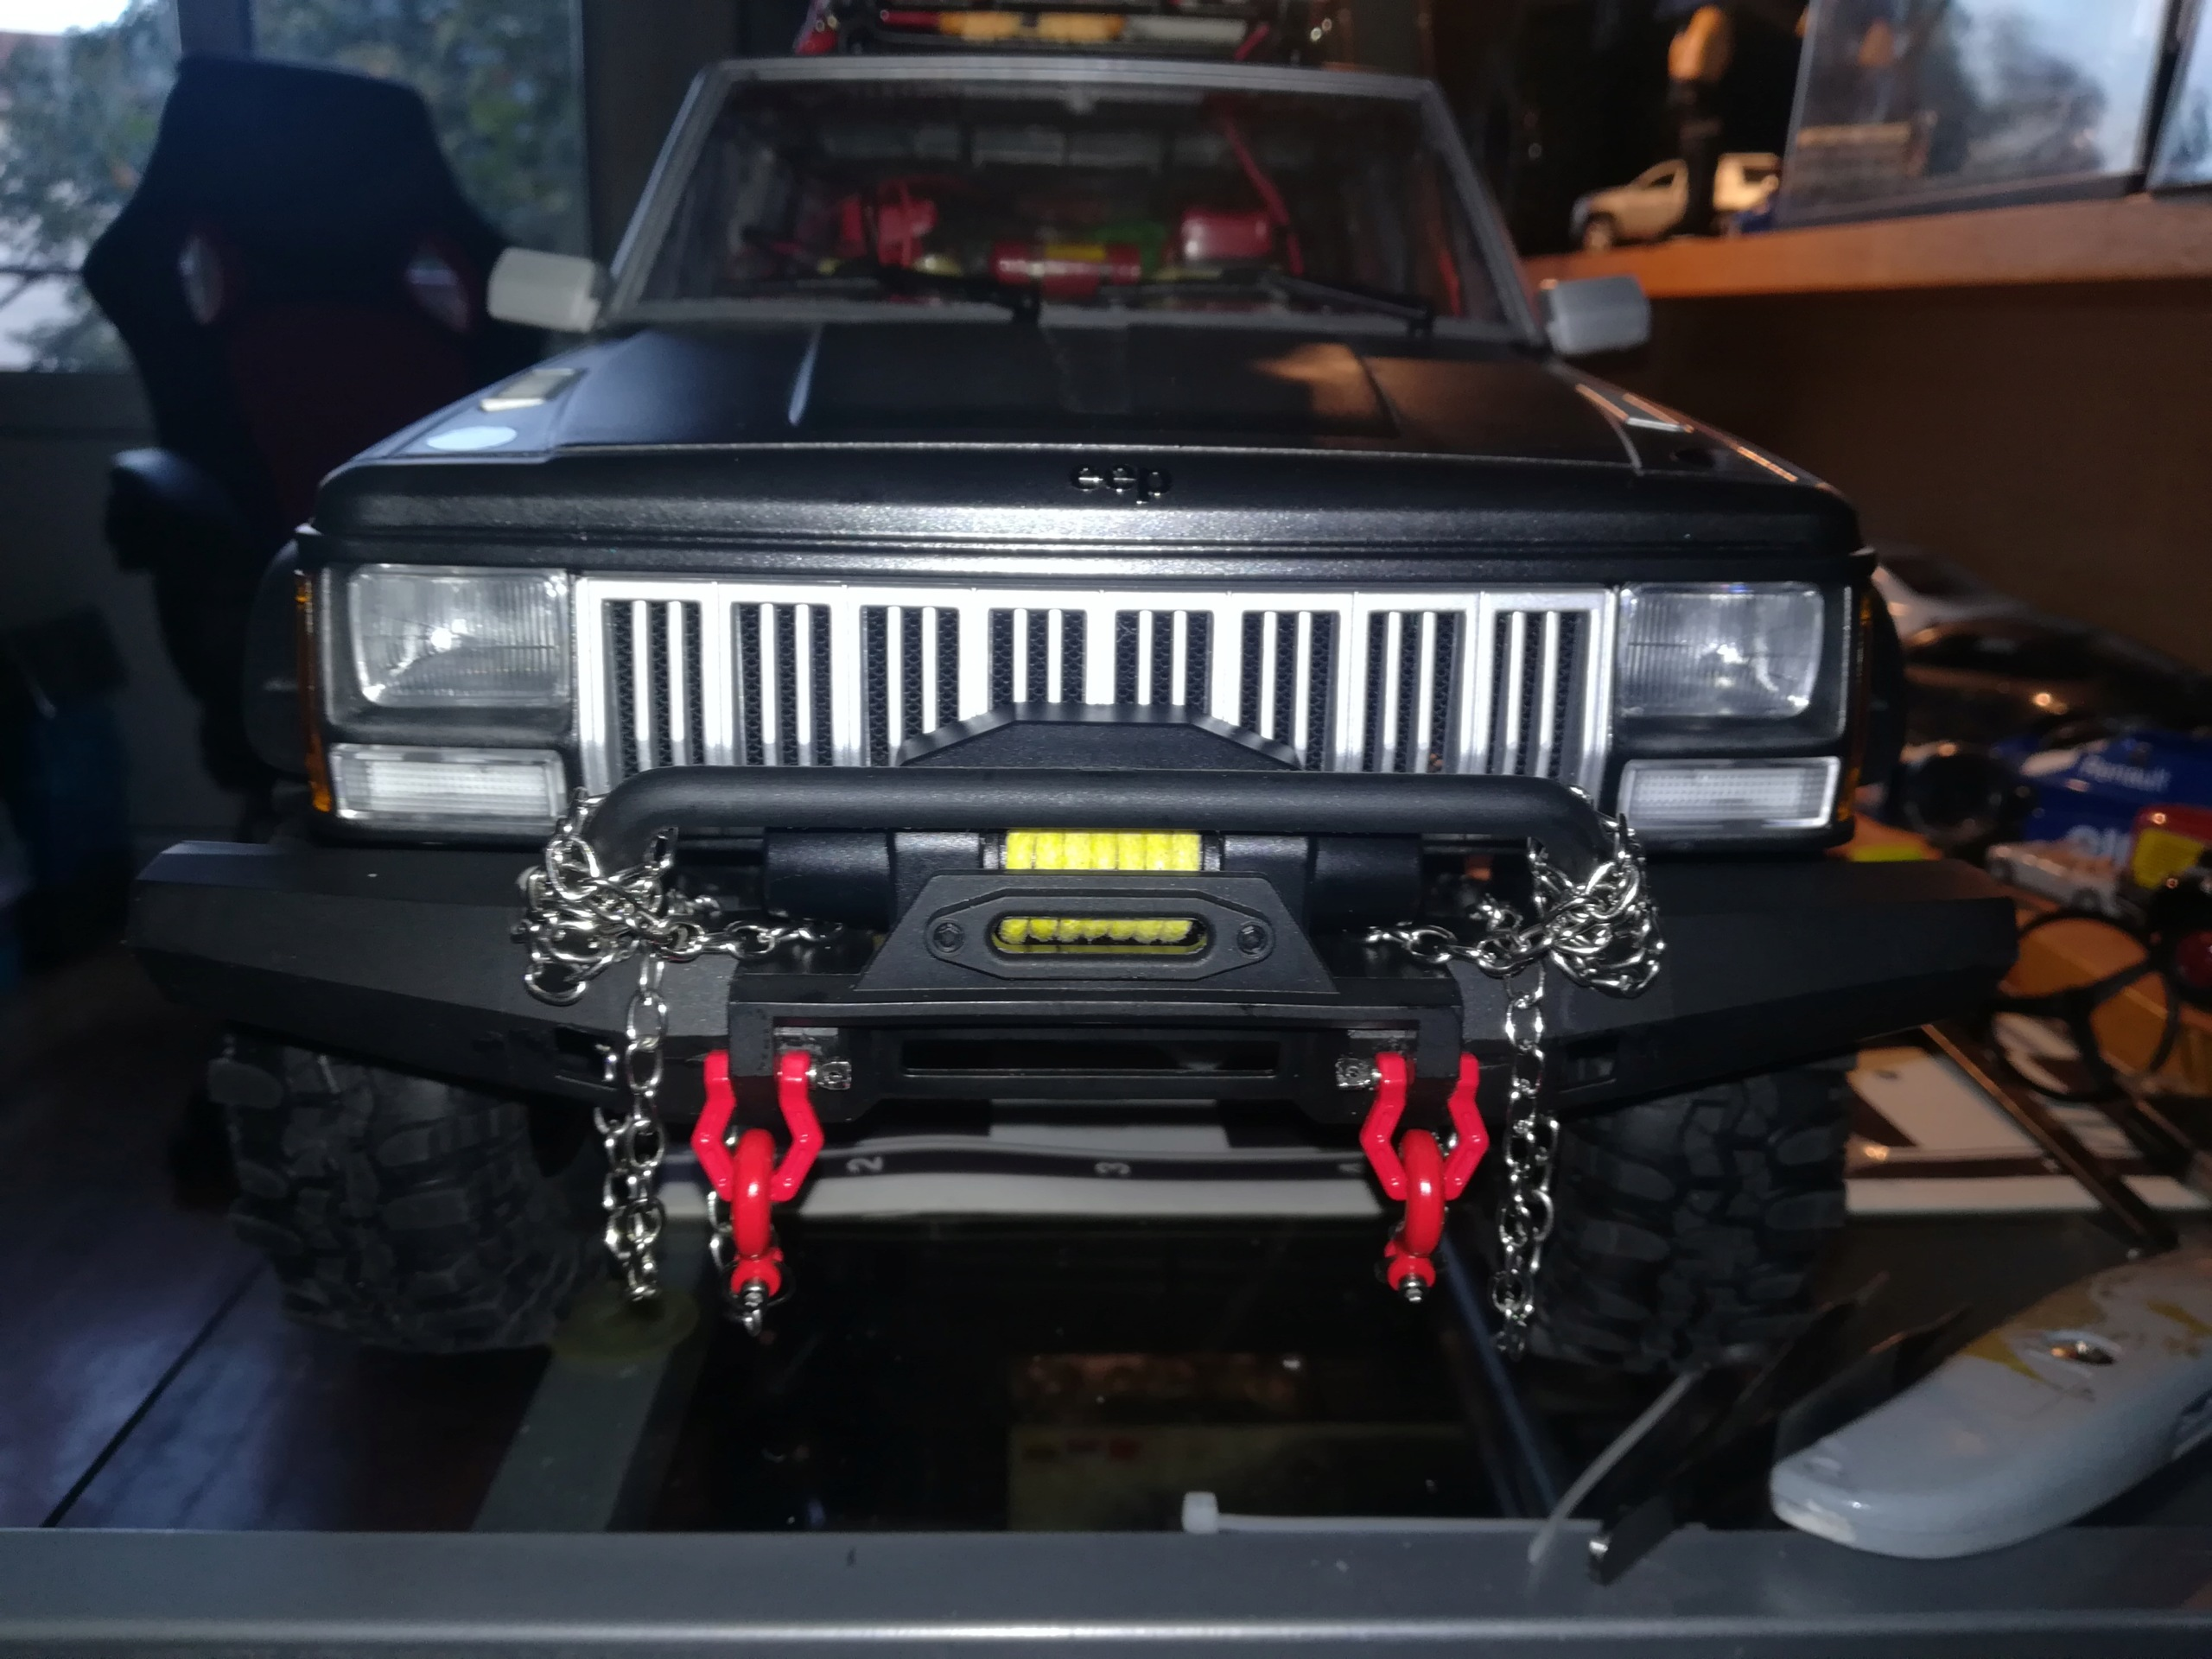 Mon TRX4 sur carrosserie Jeep Cherokee XJ 90's - Page 7 Img_2154